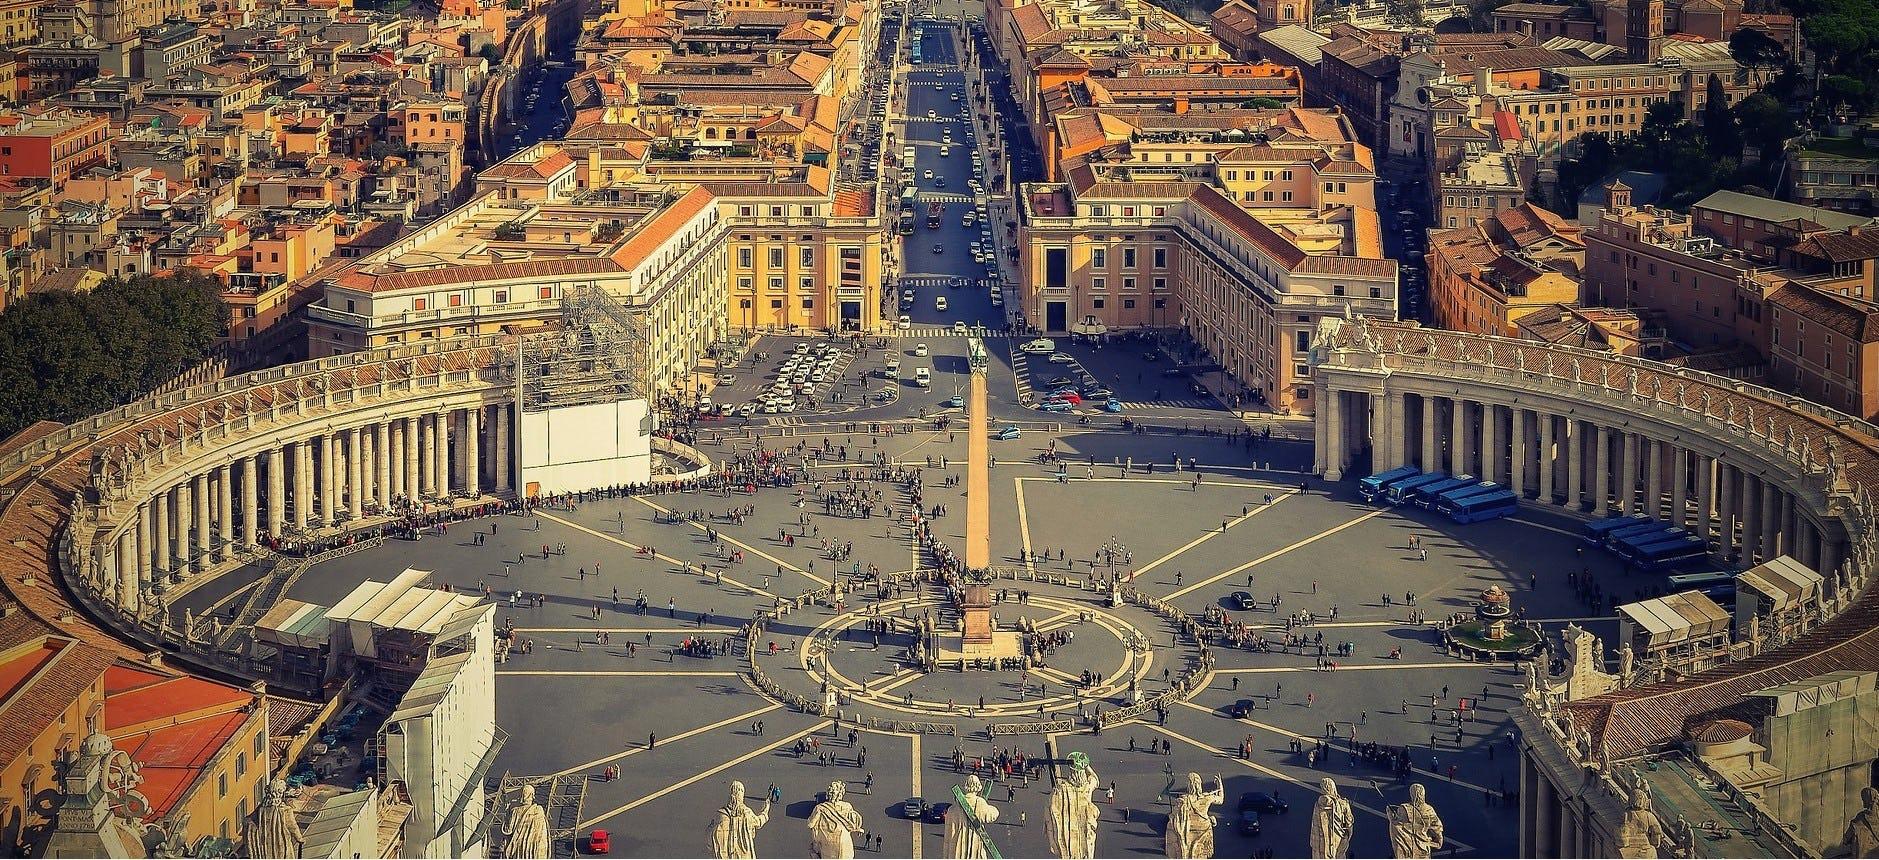 Roma med Petersplassen © Walterssk, Pixabay